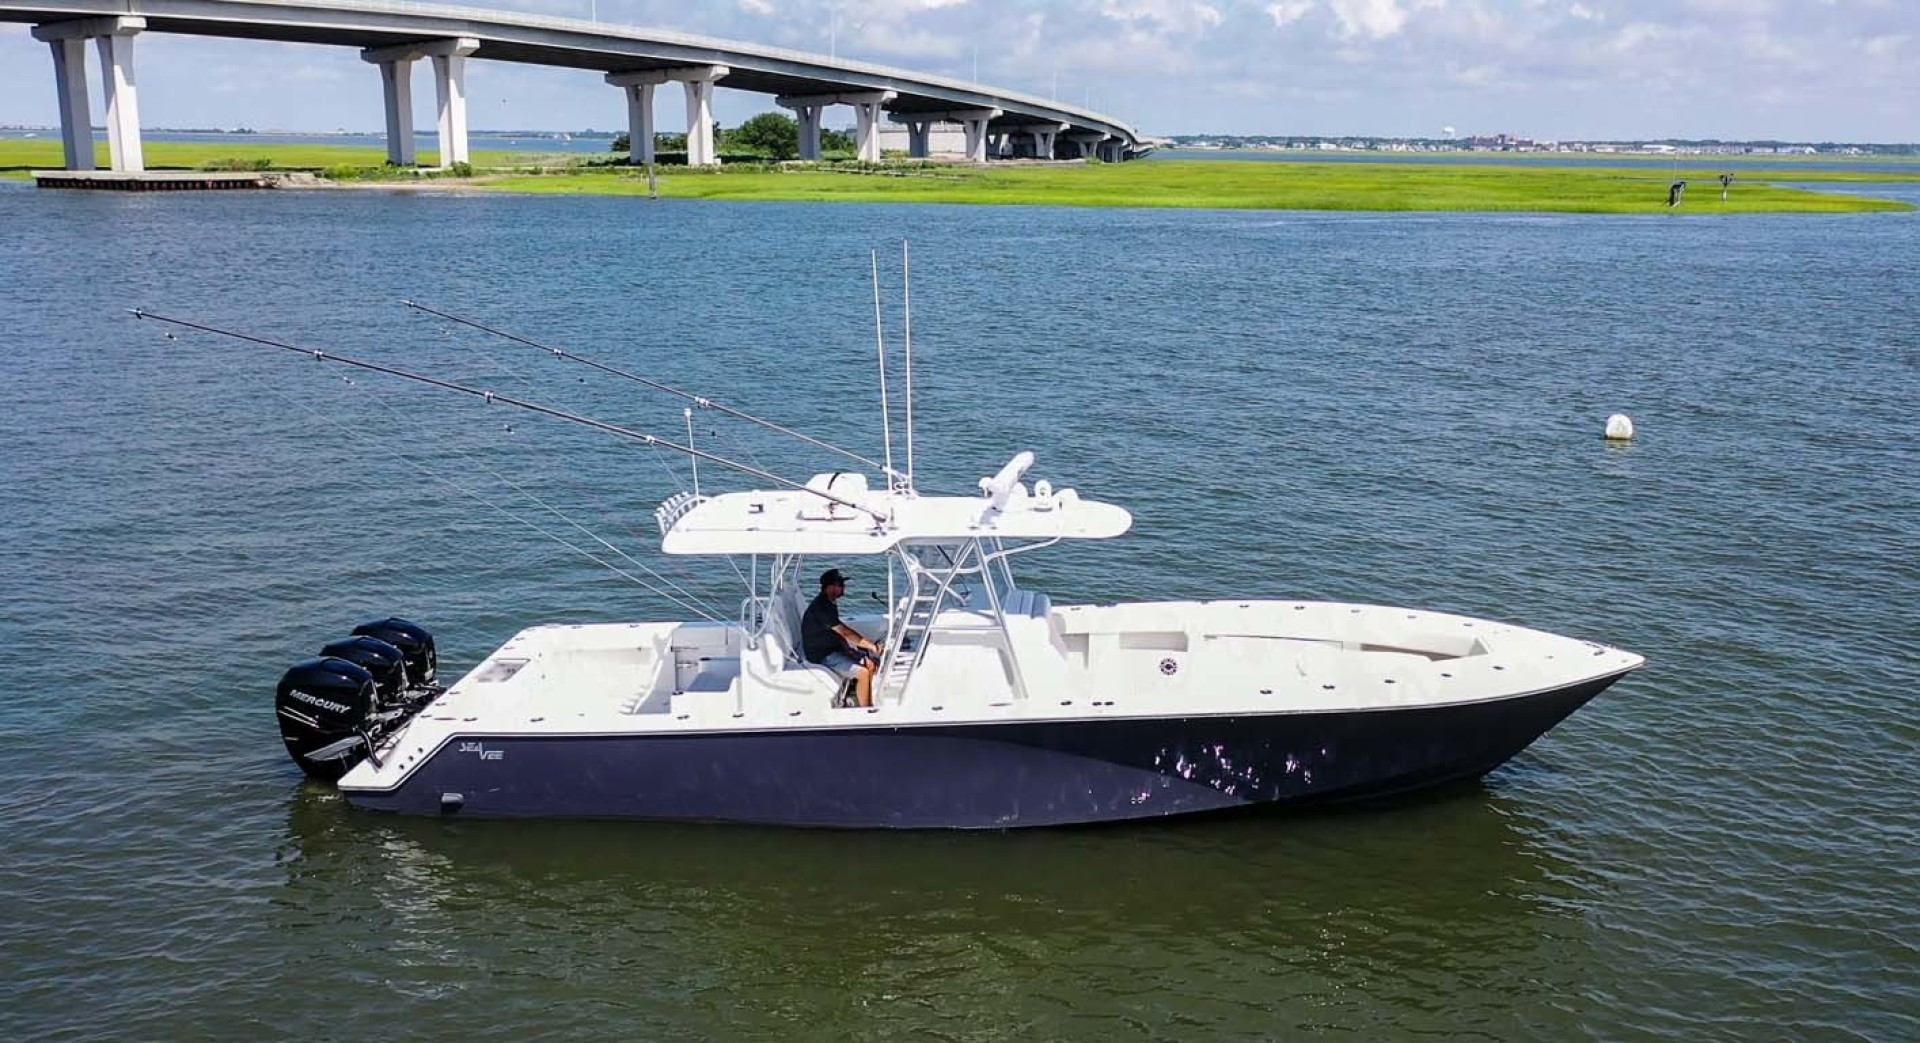 SeaVee-390 B 2019 -Cape May-New Jersey-United States-Main Profile-1438356 | Thumbnail